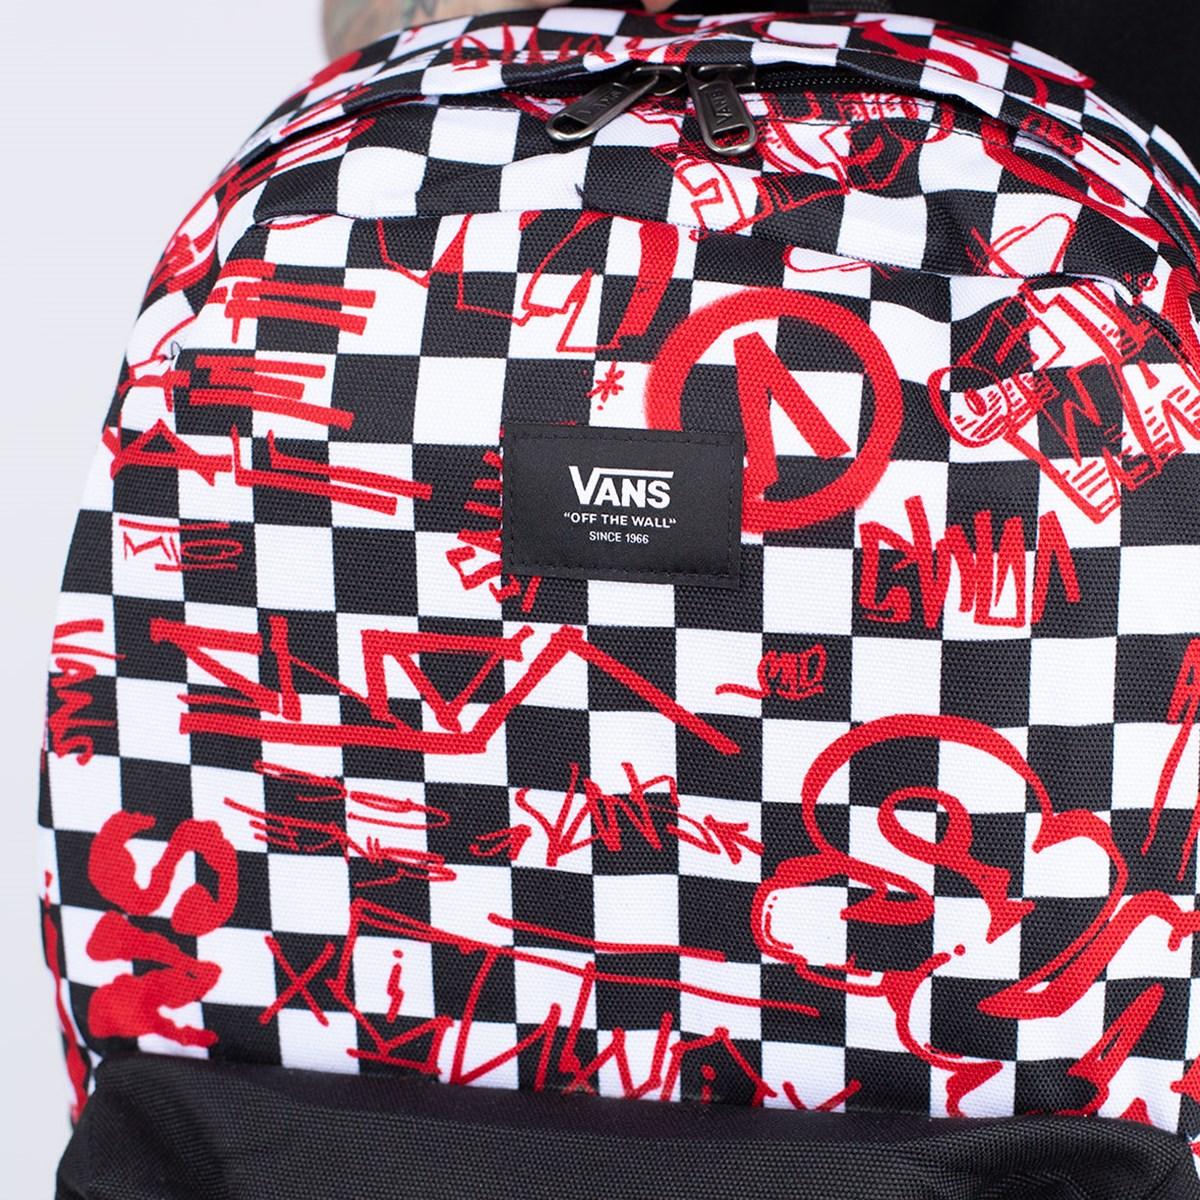 Mochila Vans Old Skool III Backpack Crew Checkerboard VN0A3I6RZYO